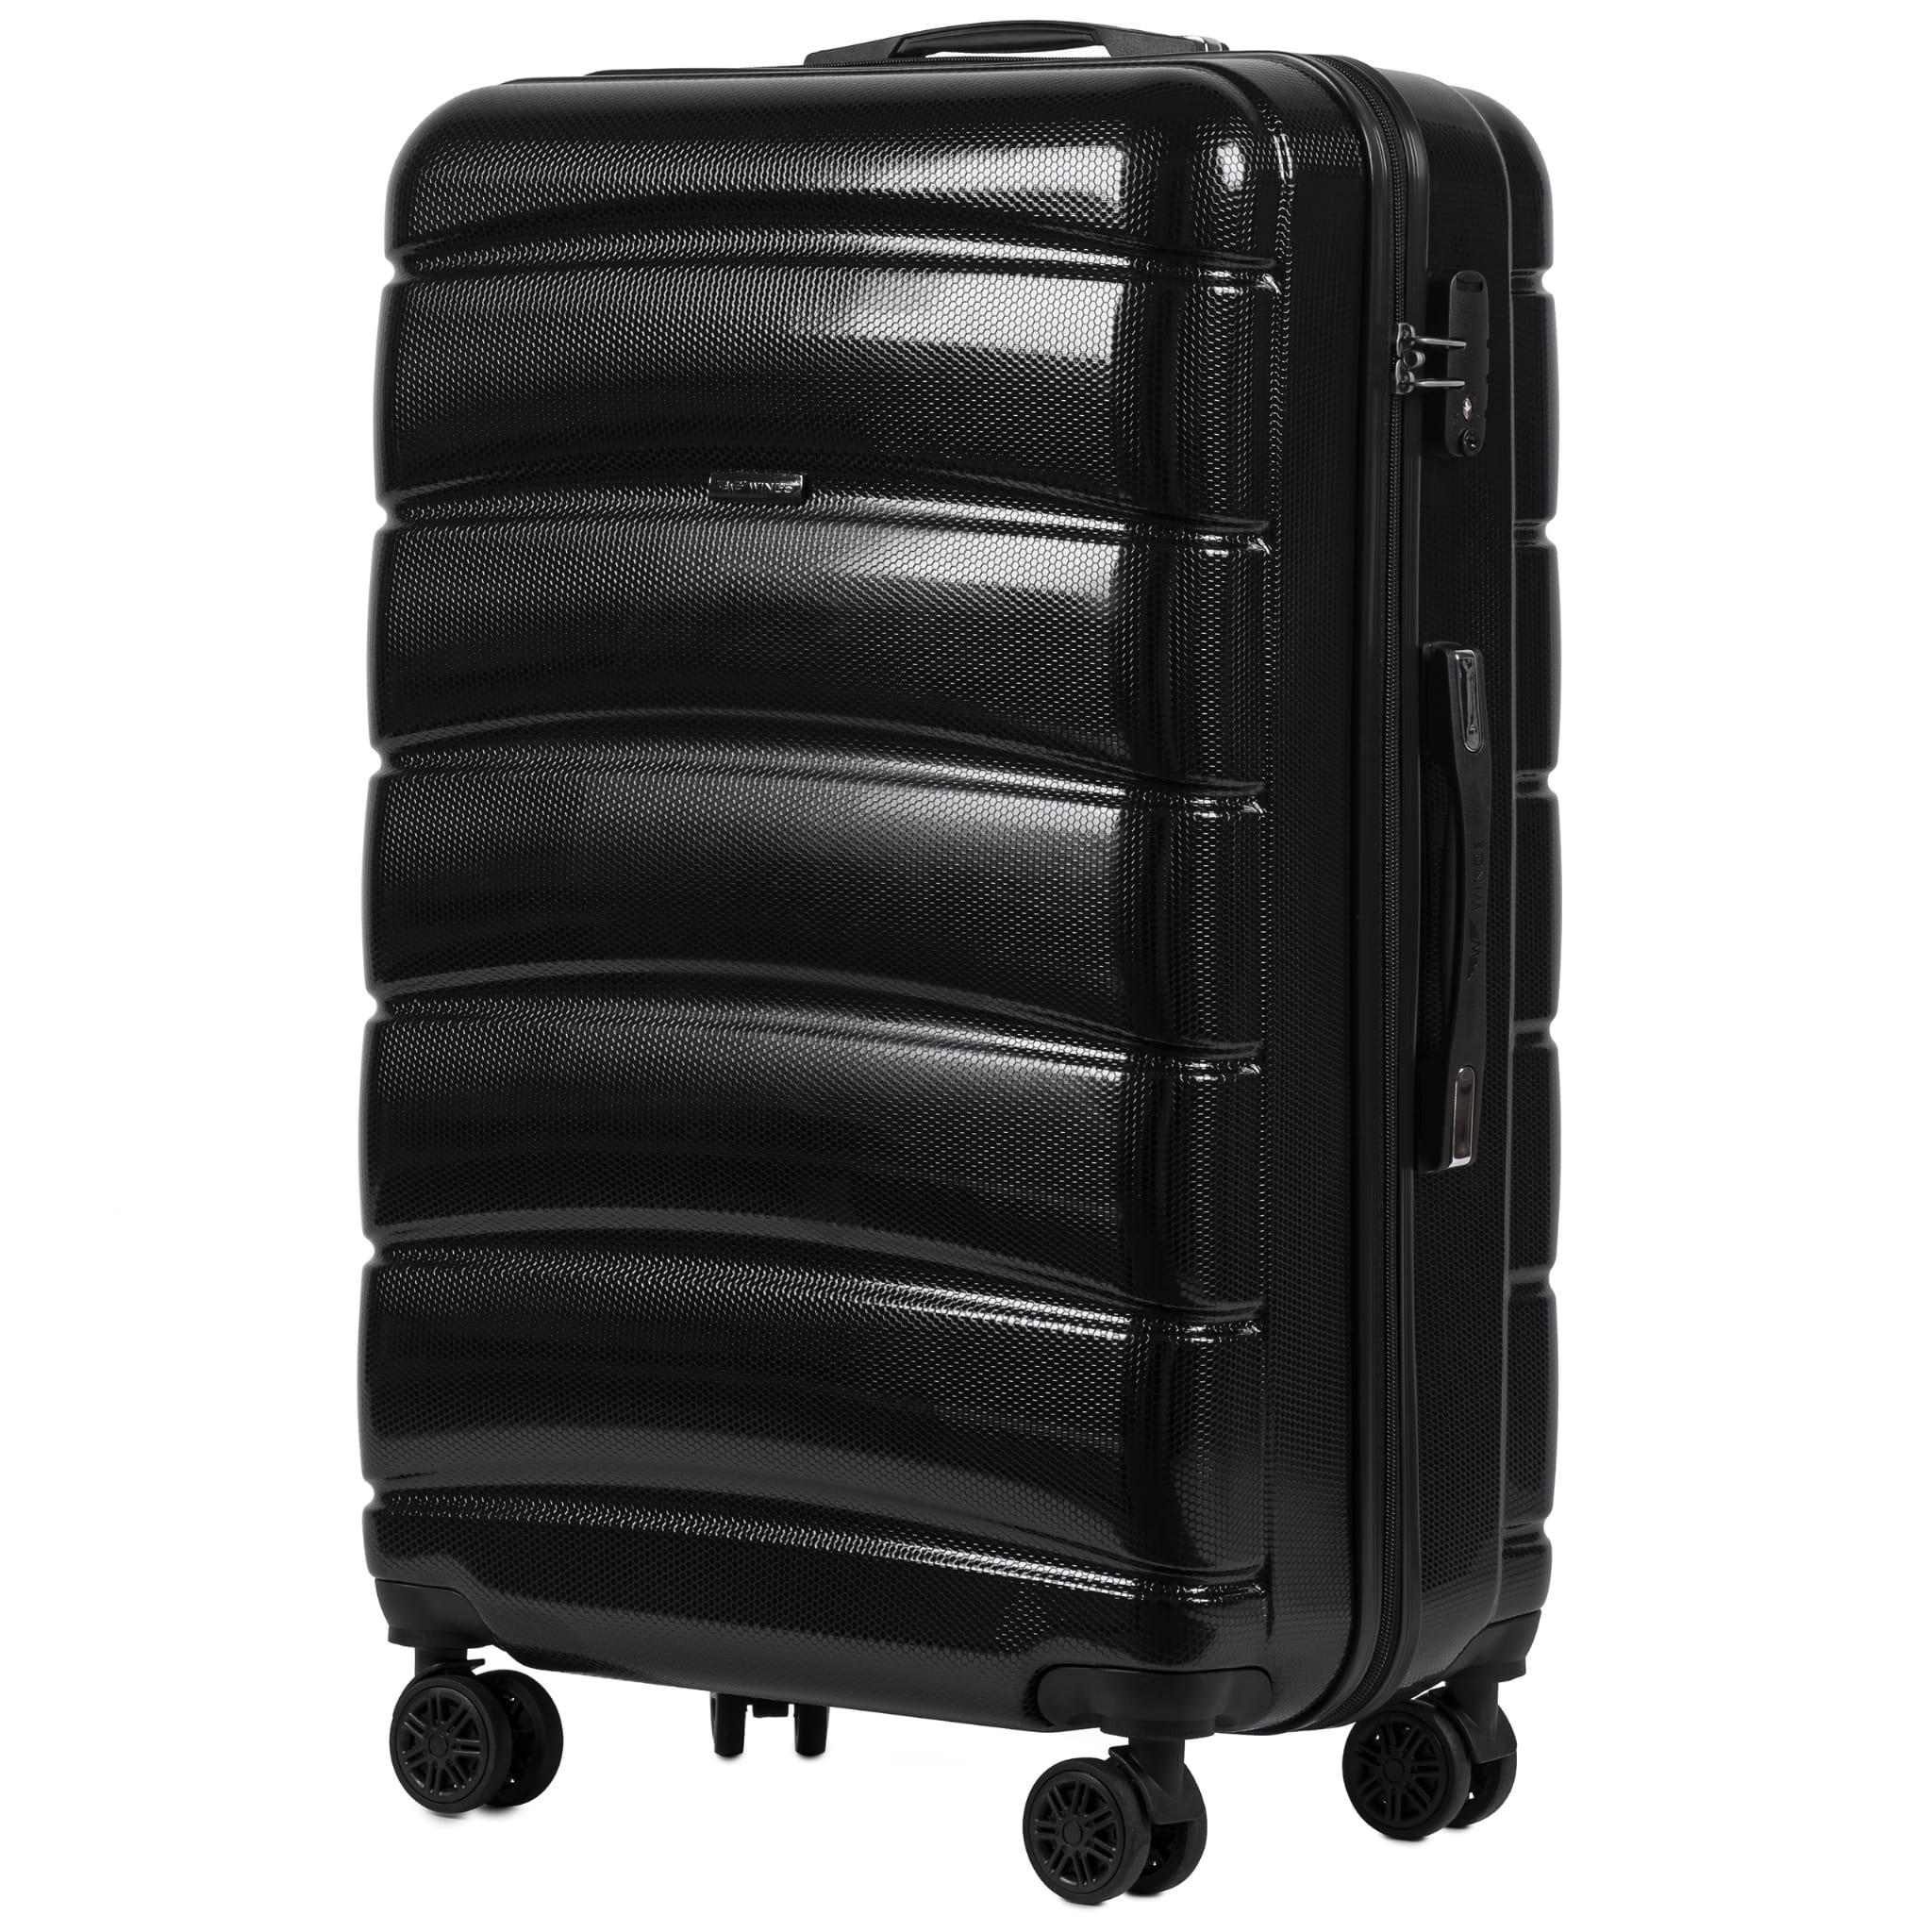 БОЛЬШОЙ ЧЕМОДАН WINGS 160 L BLACK  PREMIUM НА 4-Х КАУЧУКОВЫХ КОЛЕСАХ! Для багажа ,до 23 кг!